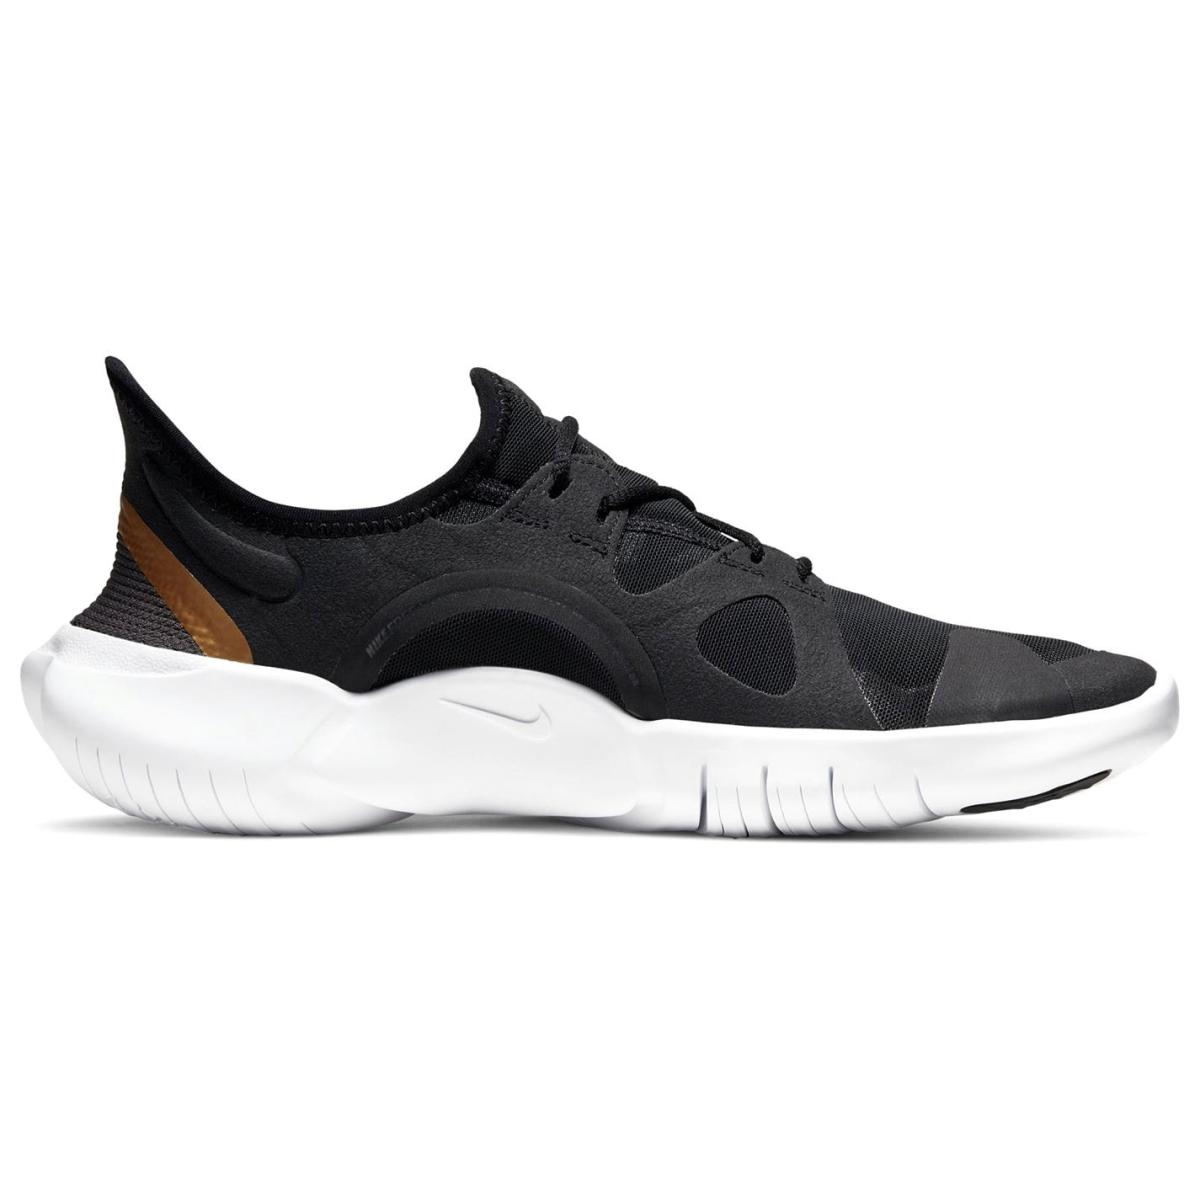 Nike-Free-Run-5-0-Turnschuhe-Damen-Sneaker-Sportschuhe-Laufschuhe-4923 Indexbild 3